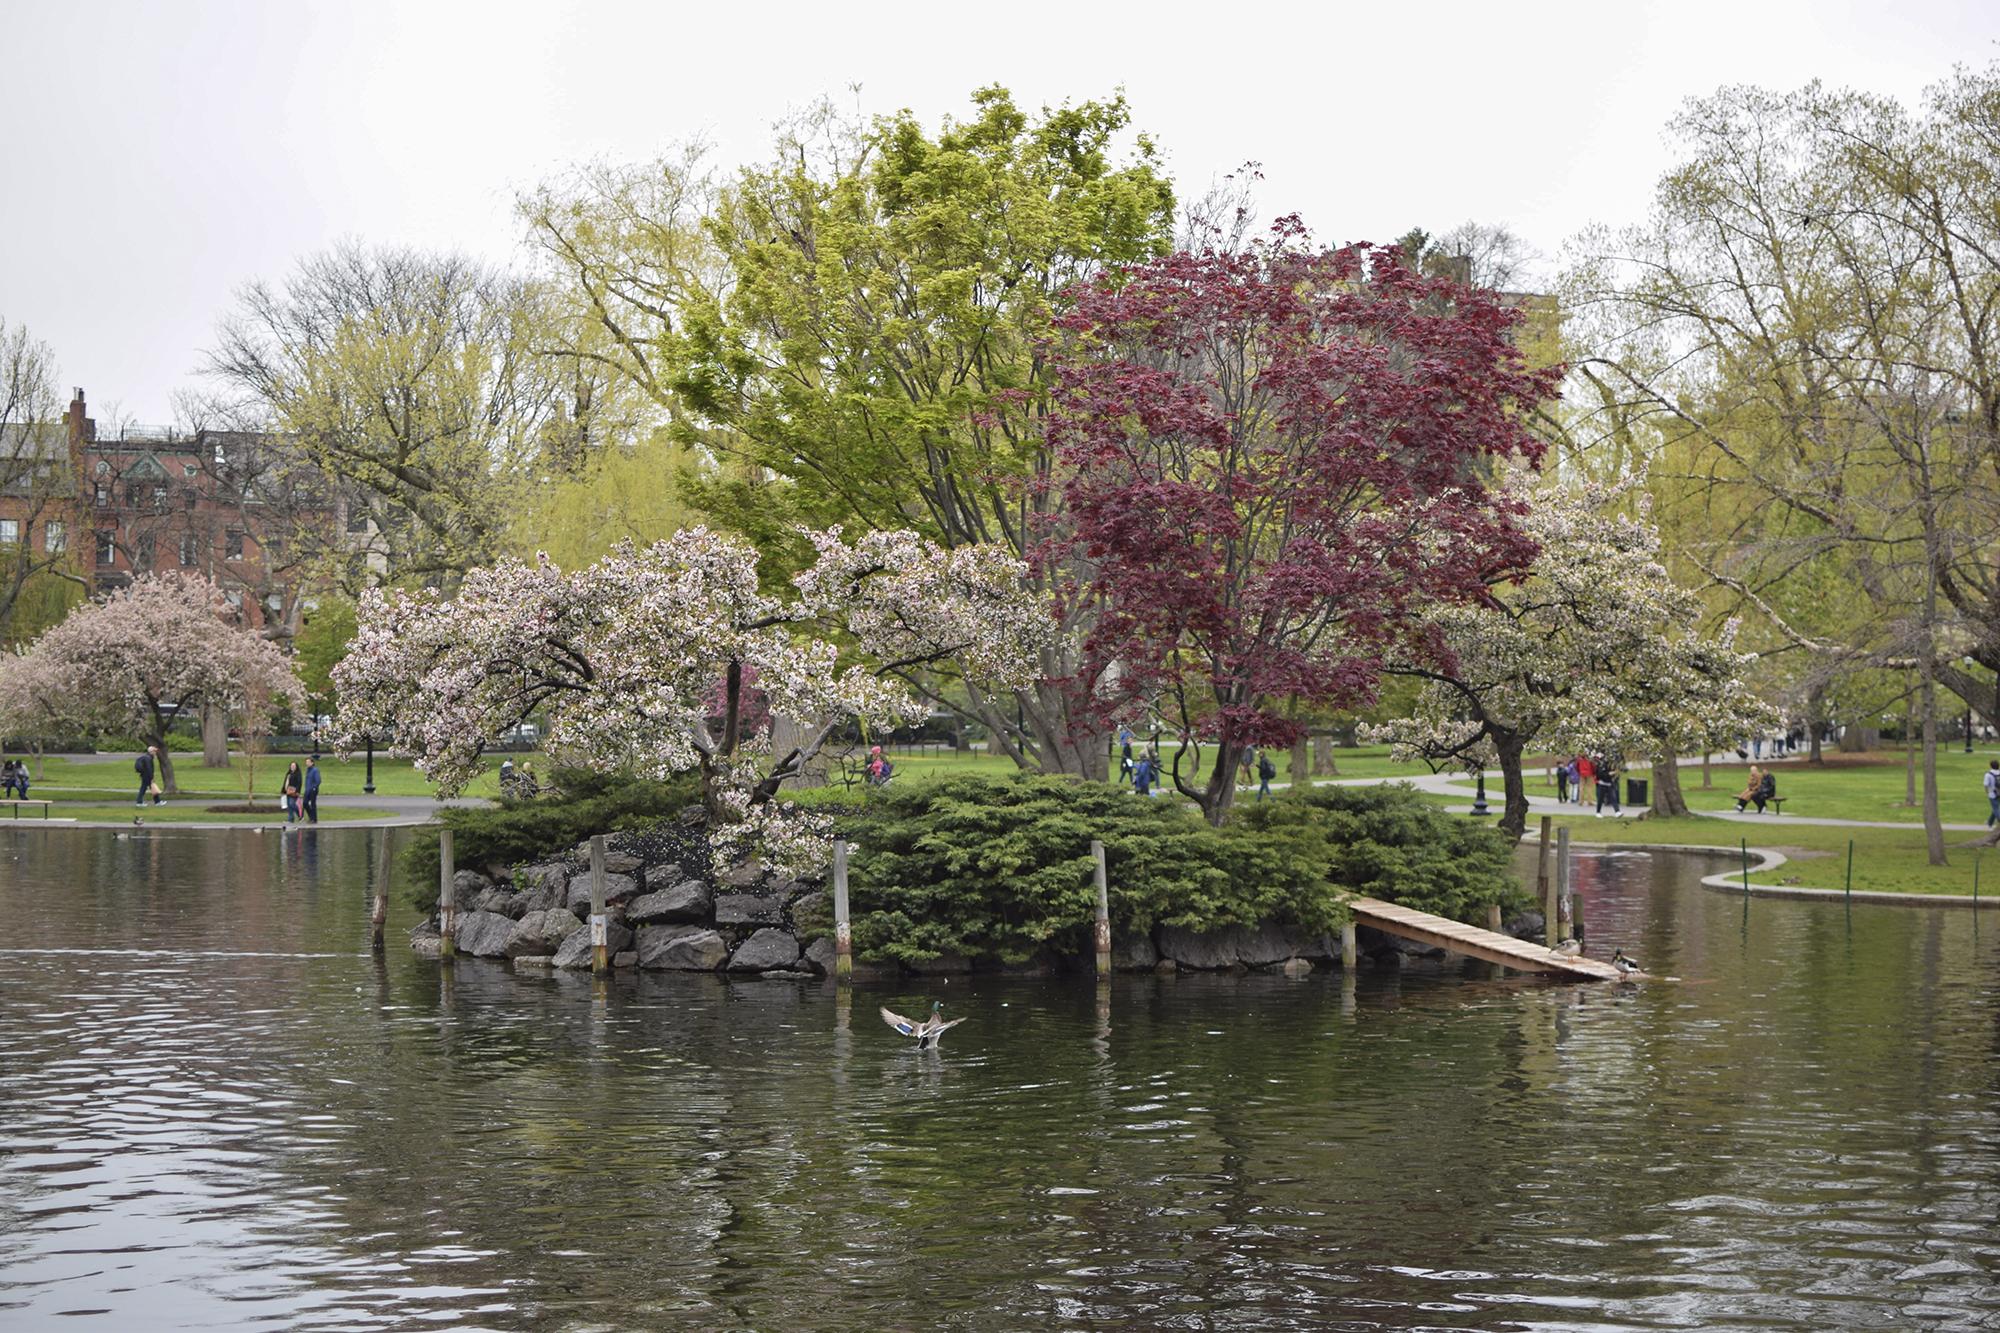 1 Boston Commons - 8 Fun Things to Do in Boston - FilterGrade